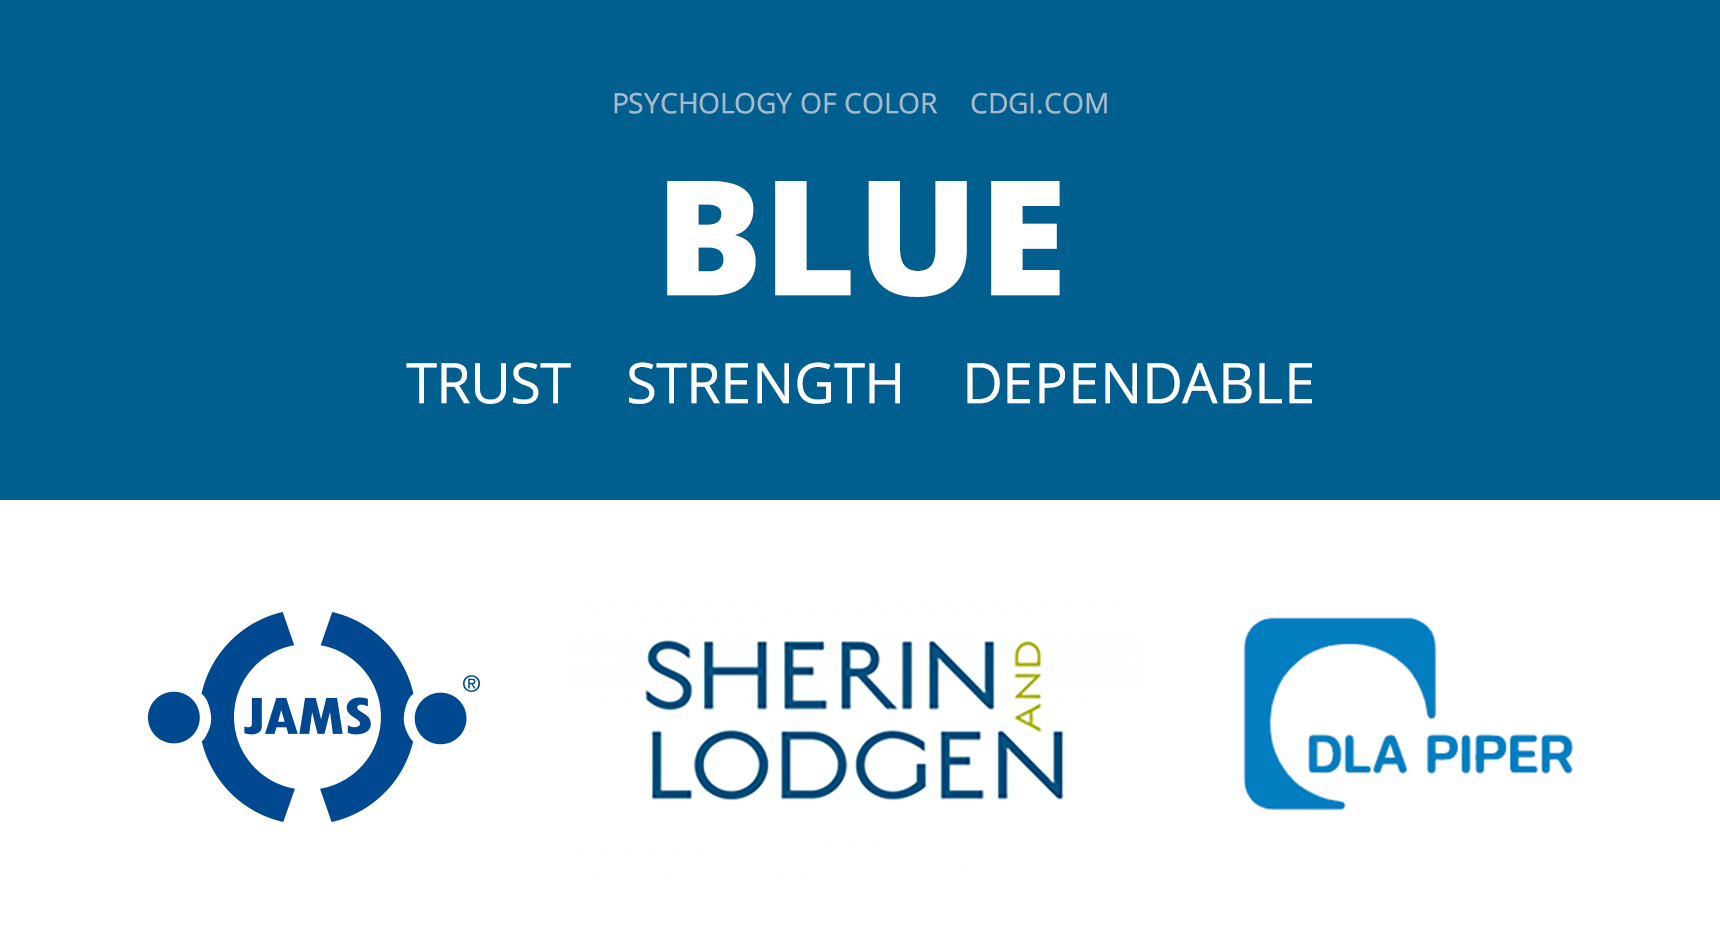 Blue: Trust, Strength, Dependable